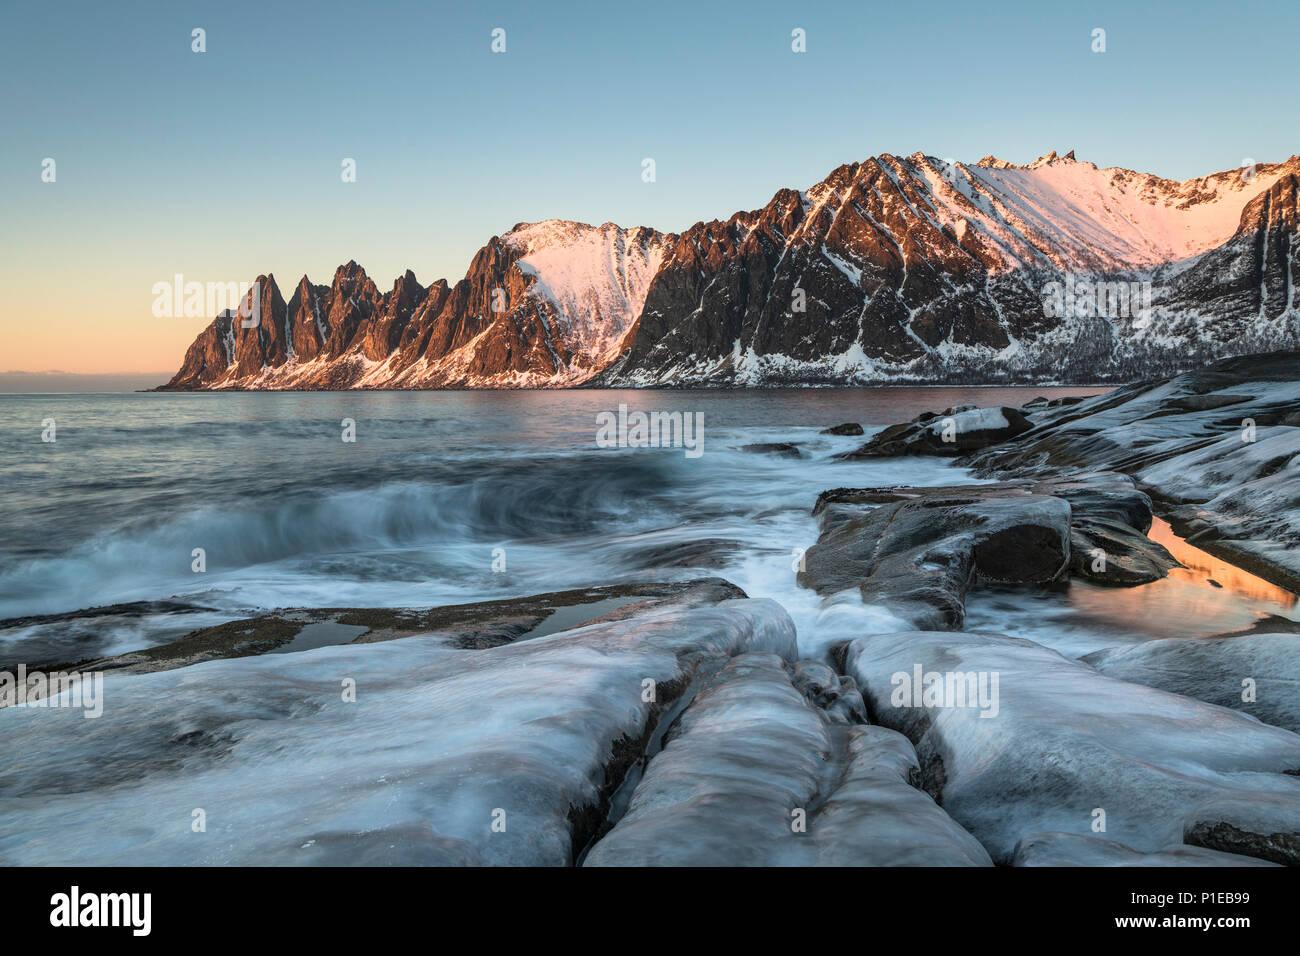 View of the Ersfjord at sunset, Oksneset, Senja, Norway - Stock Image